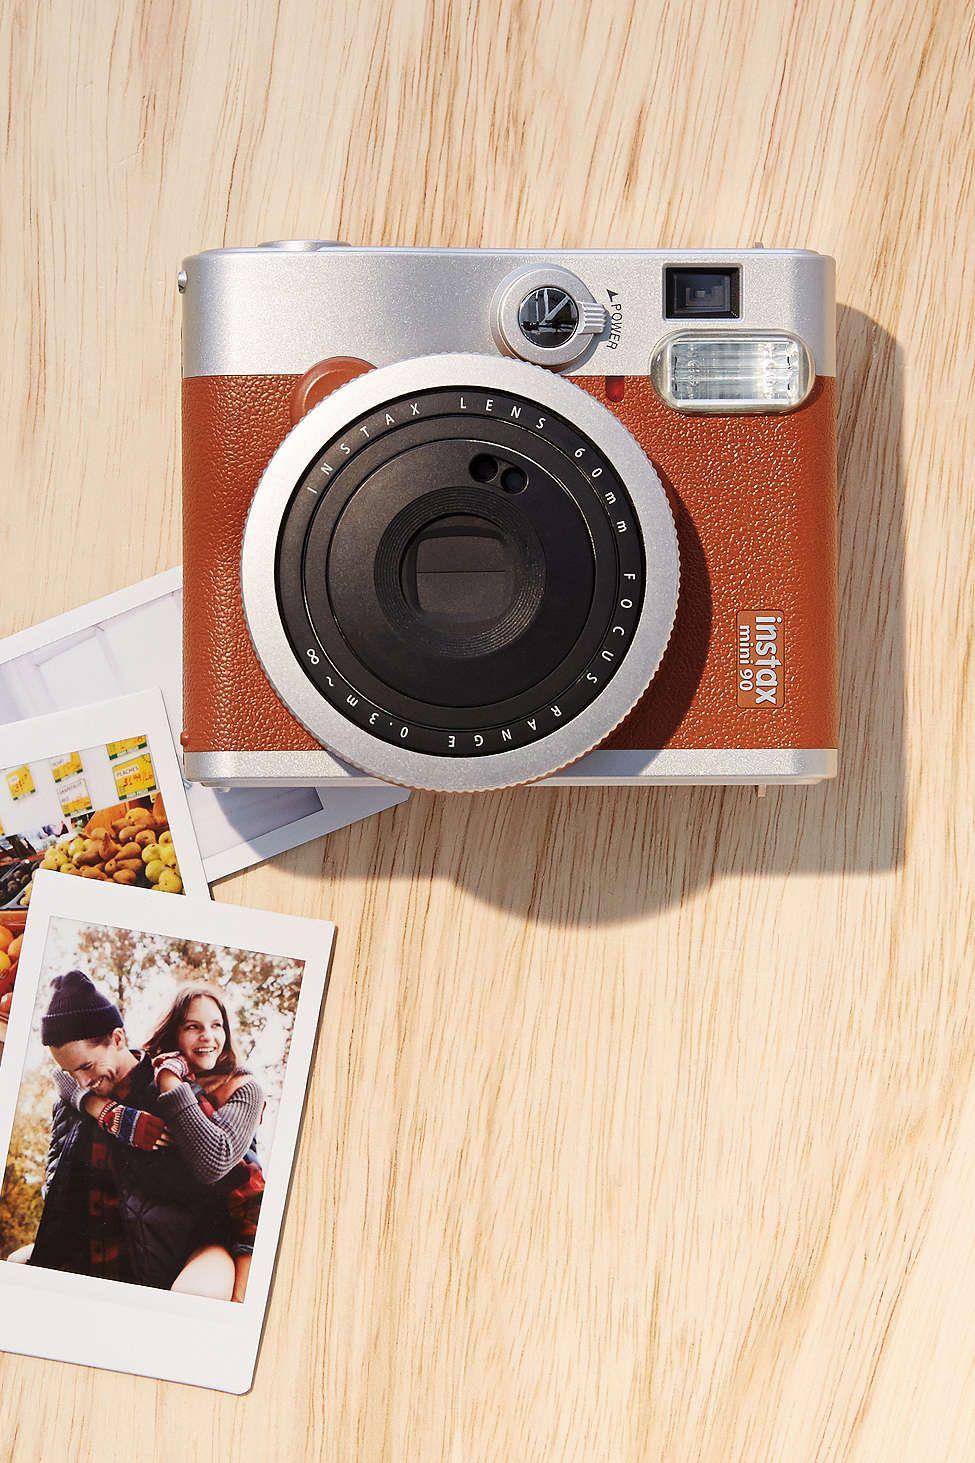 Fujifilm Instax Mini Film Fujifilm Instax Mini 90 Instax Mini 90 Fujifilm Instax Mini